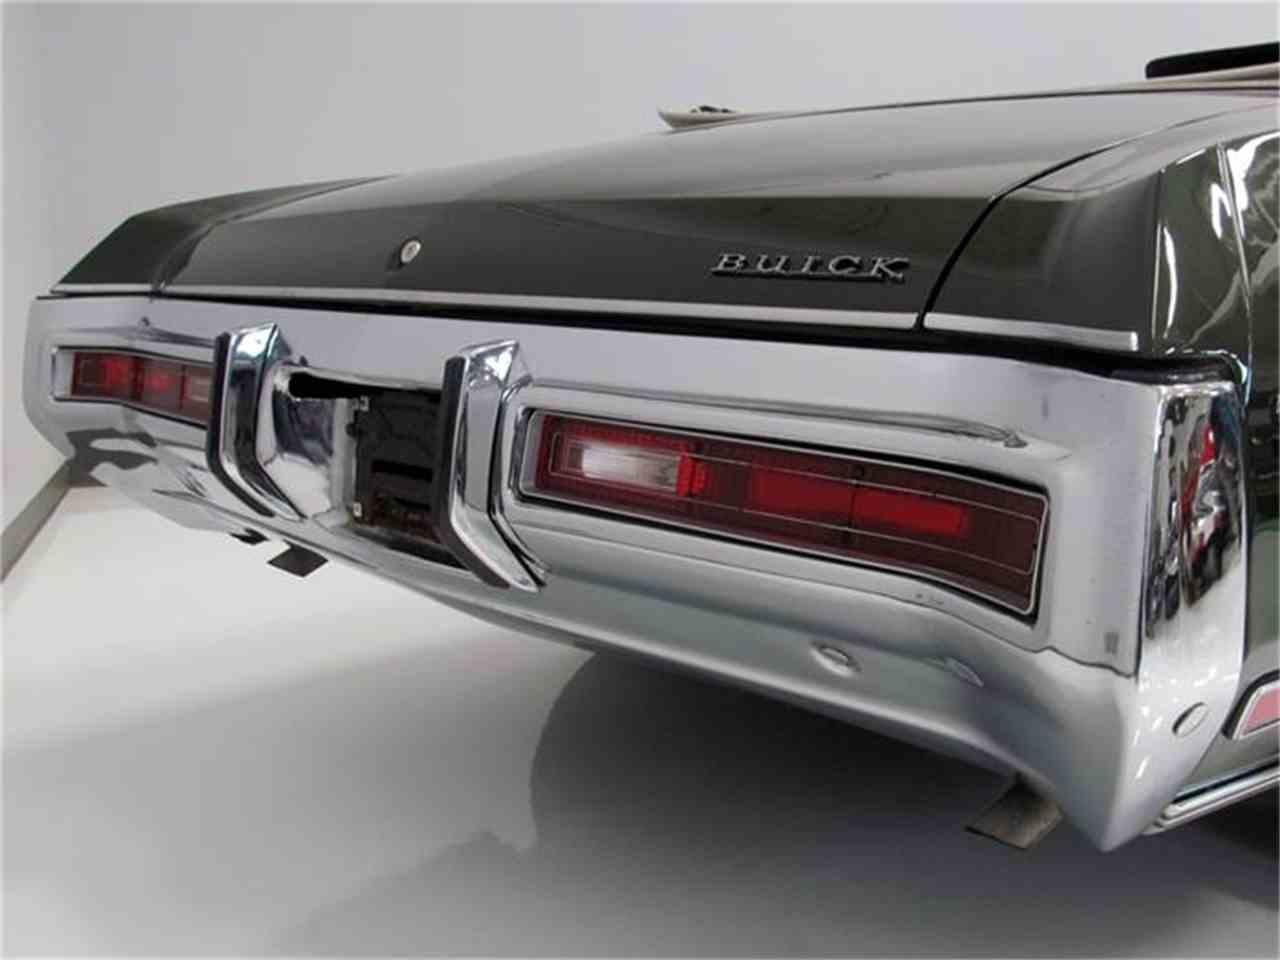 1971 Buick Skylark For Sale Classiccars Com Cc 597151